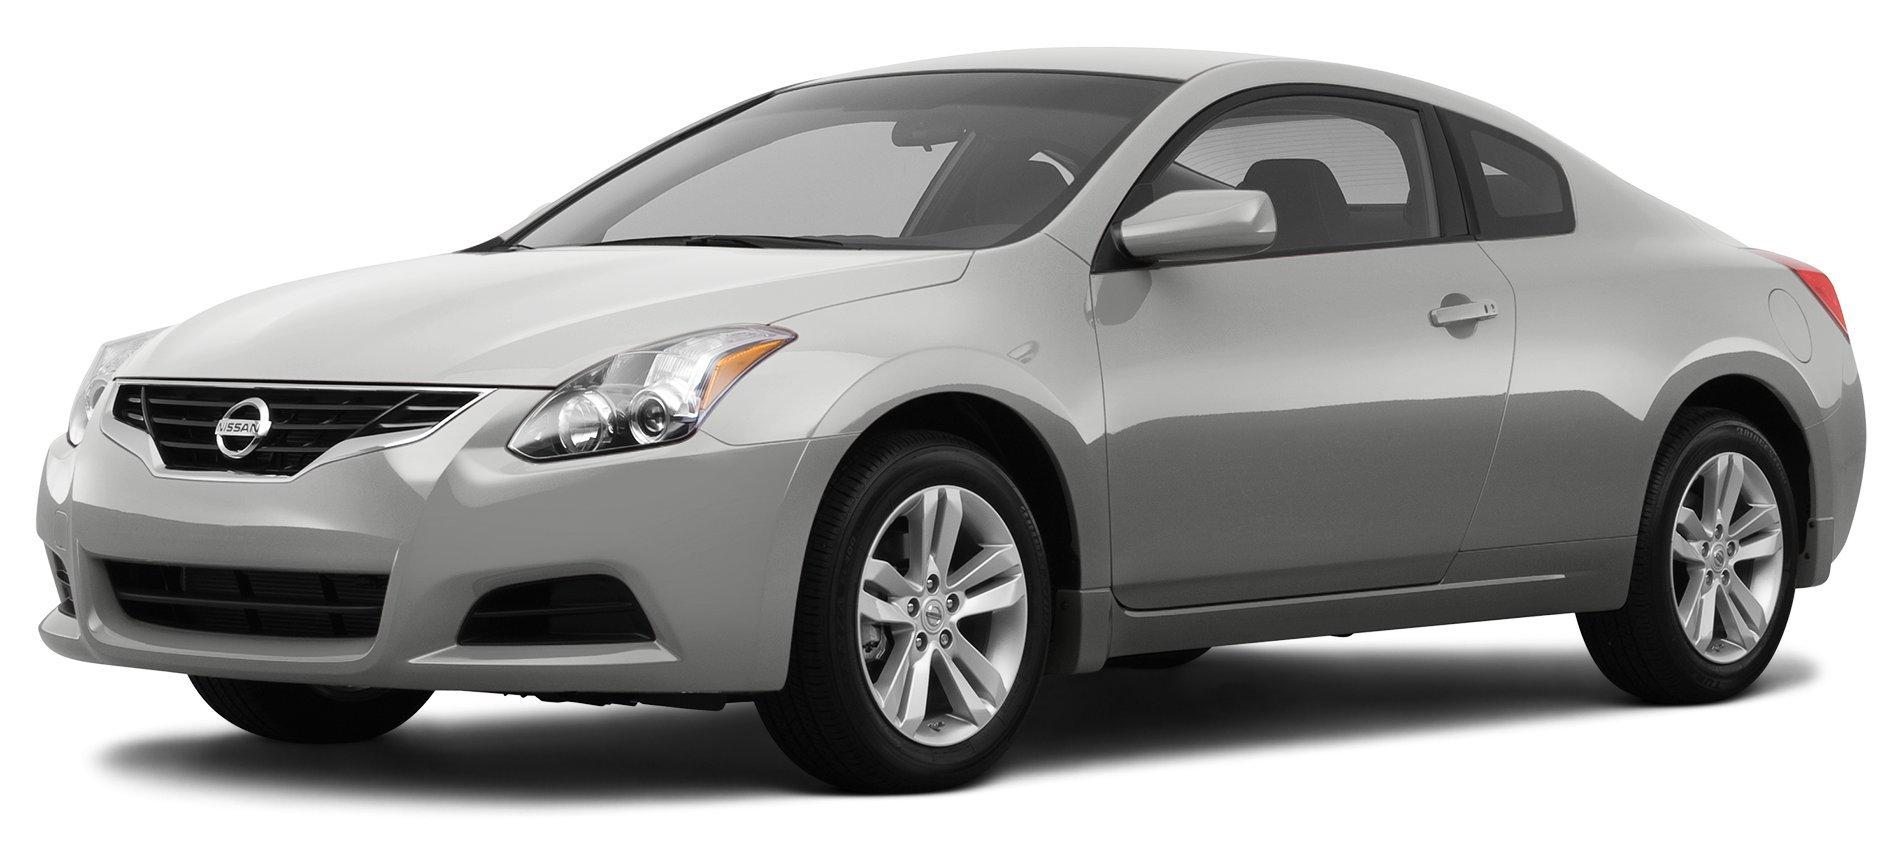 2012 honda accord manual transmission review